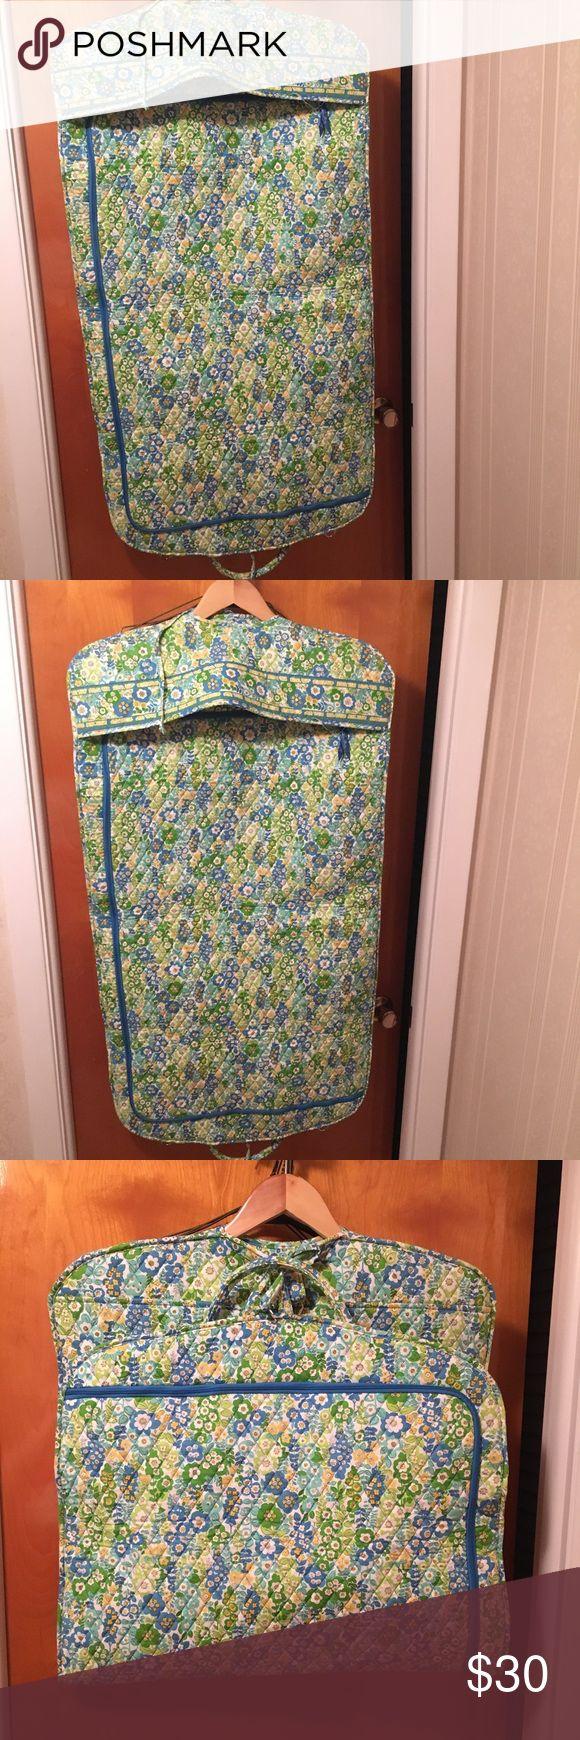 Adorable floral Vera Bradley garment bag Very nice and protective Vera Bradley Bags Travel Bags